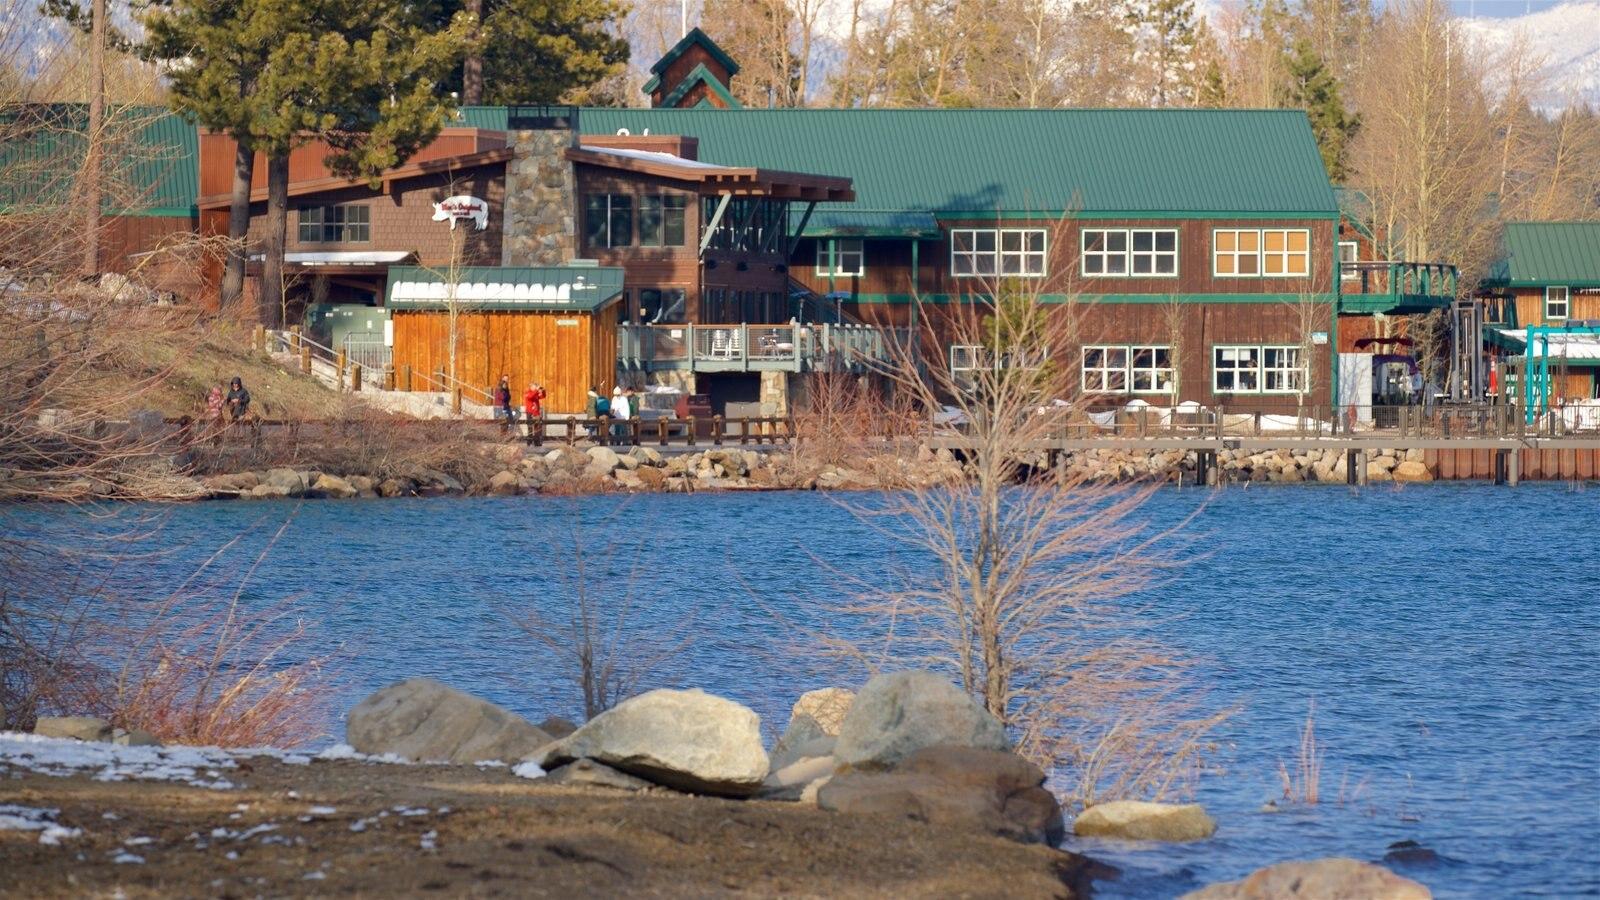 Tahoe City featuring a lake or waterhole